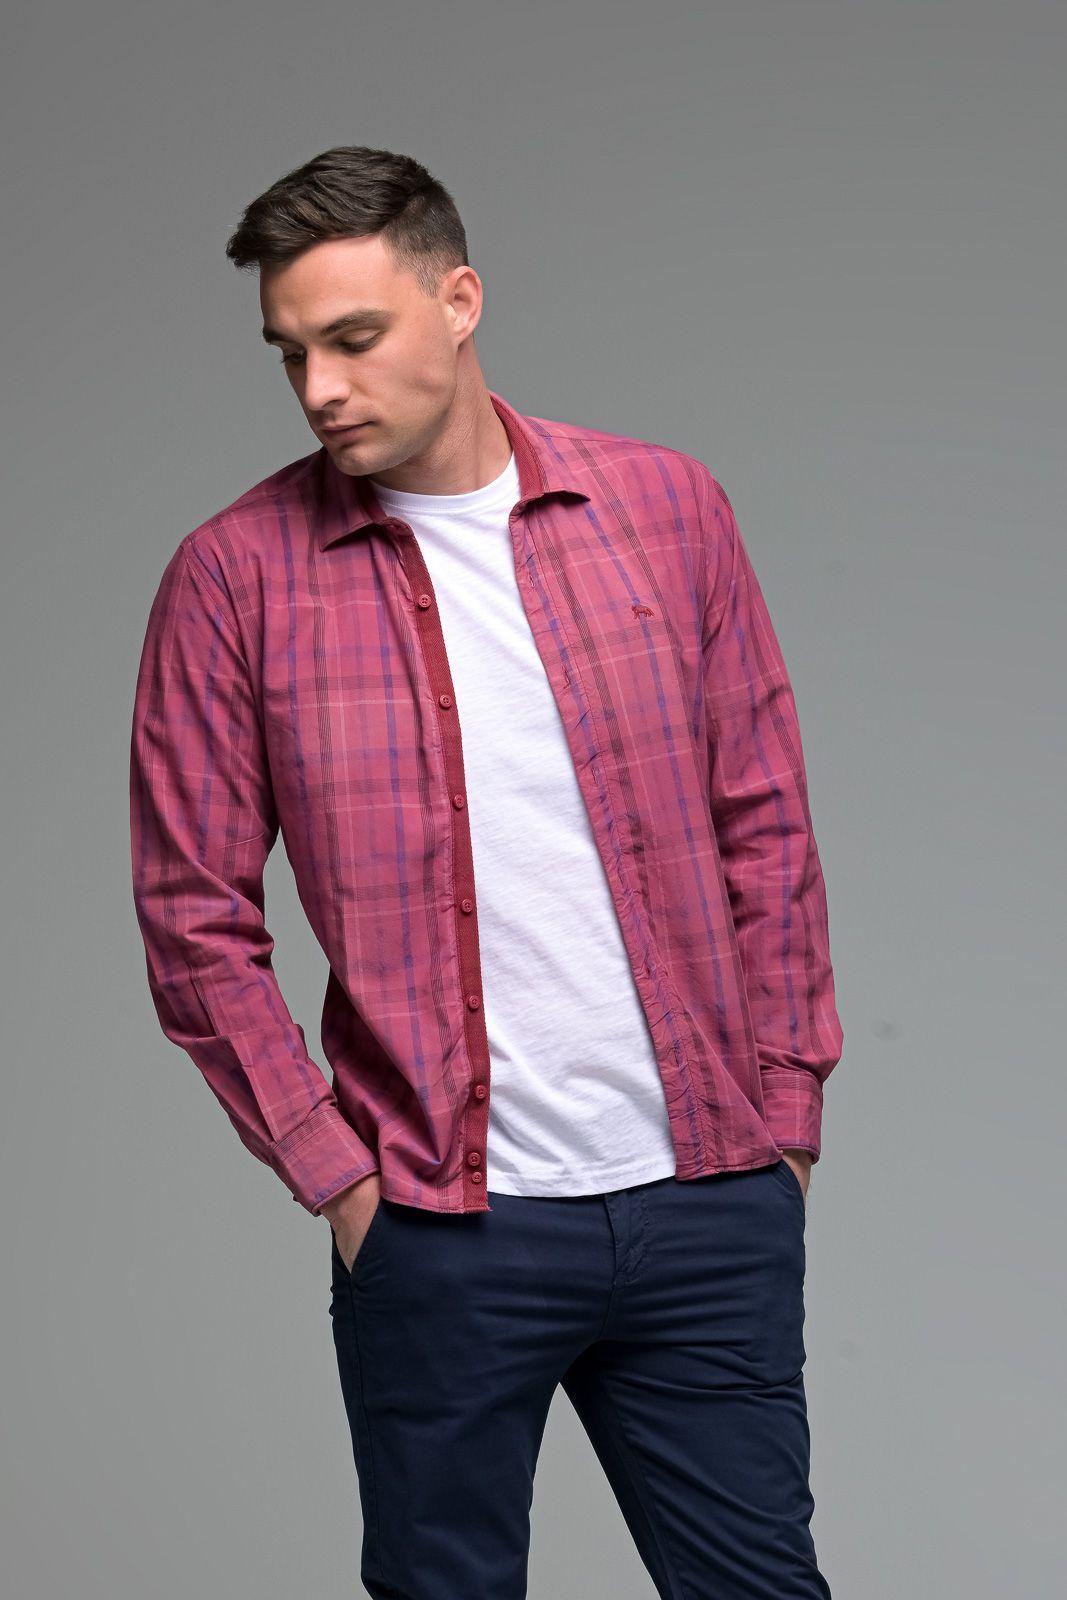 Casual Κόκκινο Καρό Ανδρικό Πουκάμισο - Slim Fit